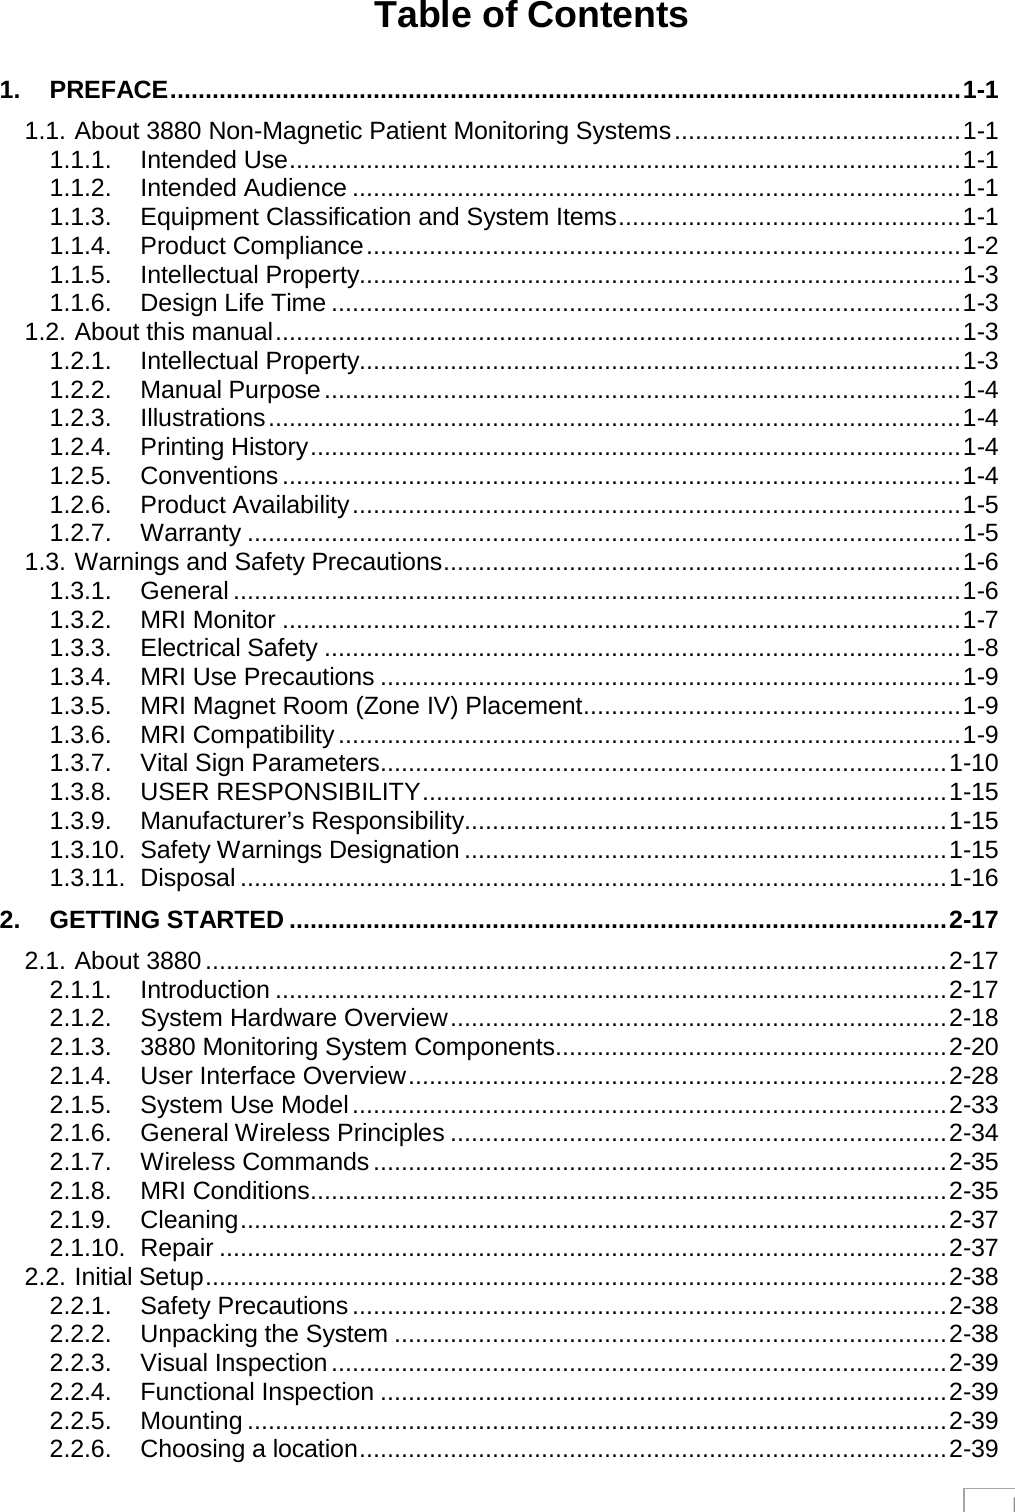 Iradimed Irm01 Mri Wireless Ecg Epod User Manual Linq